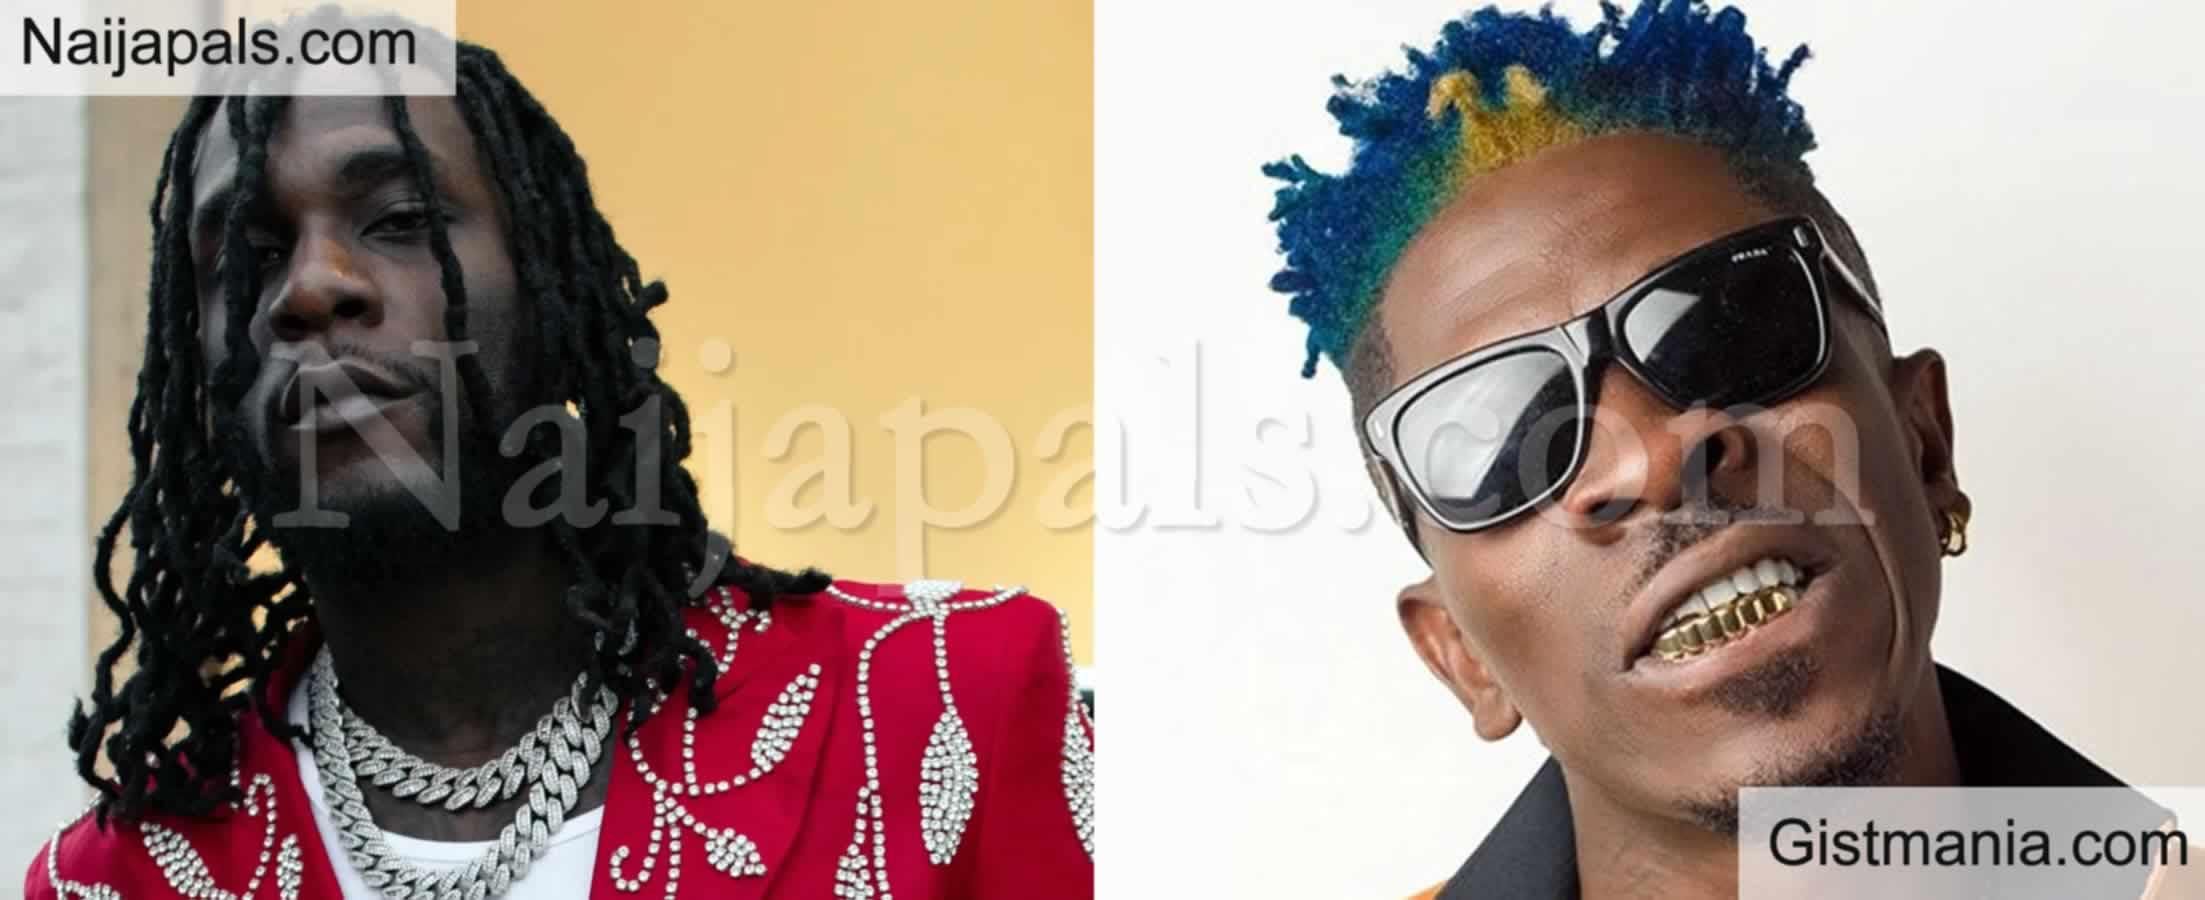 "<img alt='.' class='lazyload' data-src='https://img.gistmania.com/emot/video.gif' /> VIDEO: <b>""You Are a P Boy"" - Shatta Wale Blasts Burna Boy For Gossiping About Him In Ghana</b>"